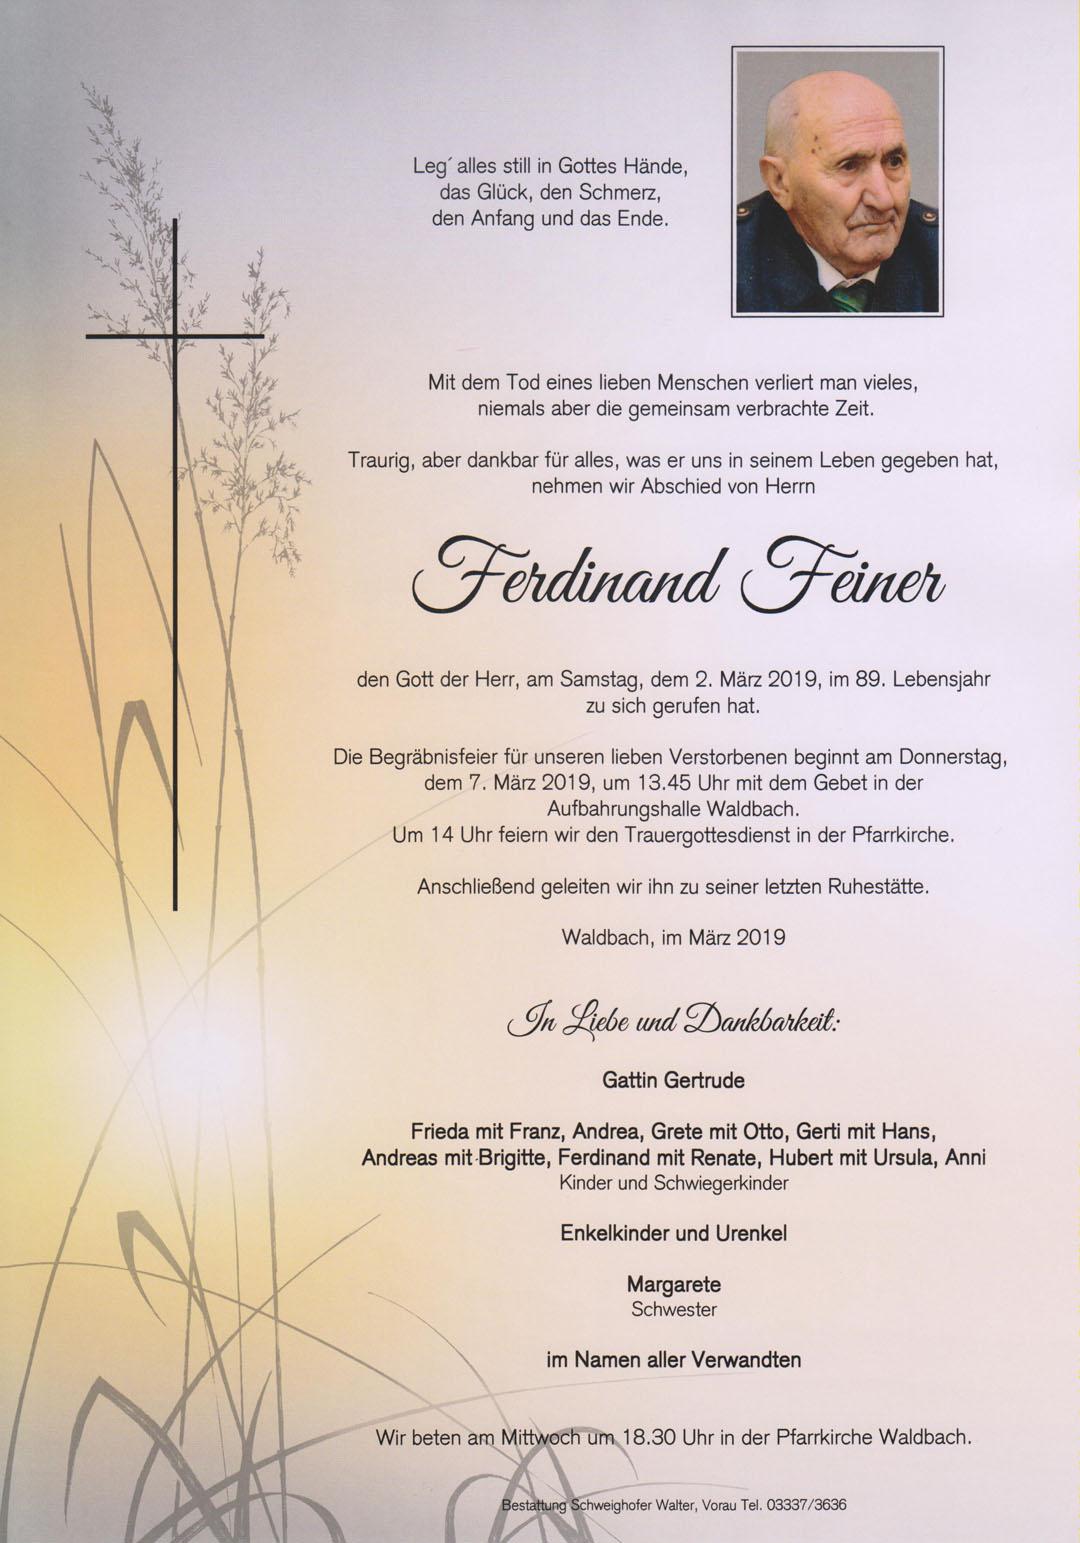 Ferdinand Feiner